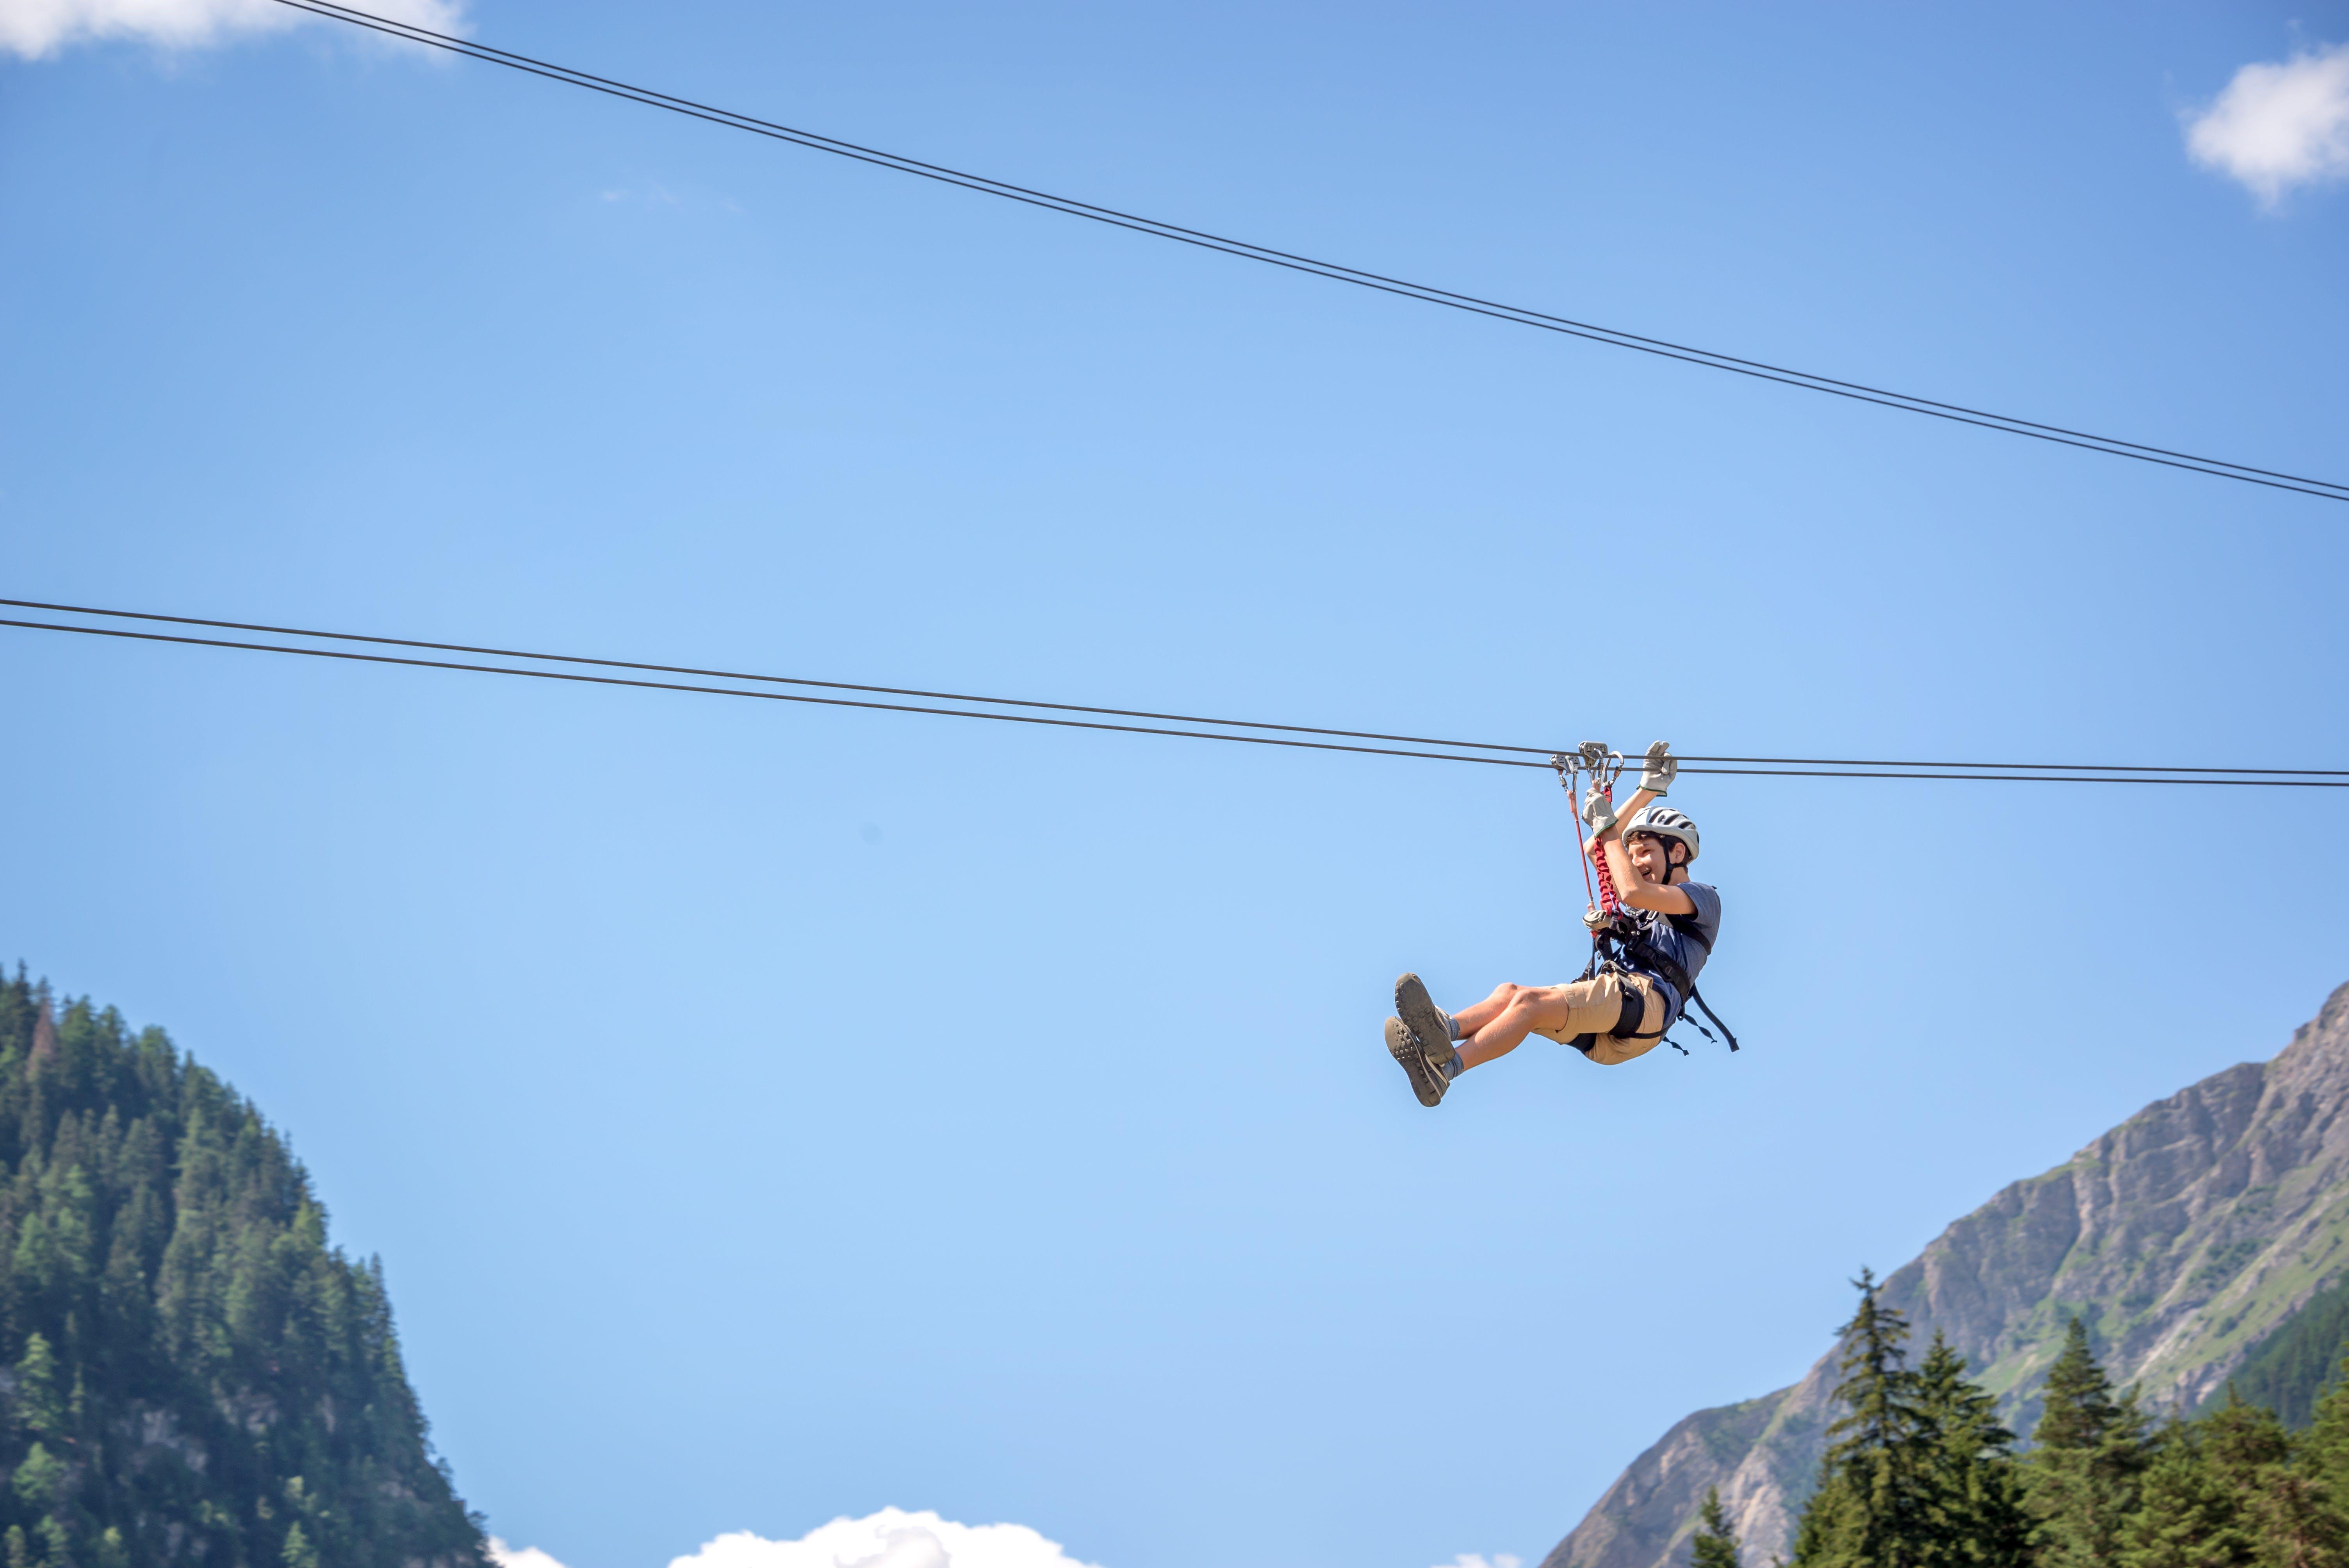 Zip lining in Alaska